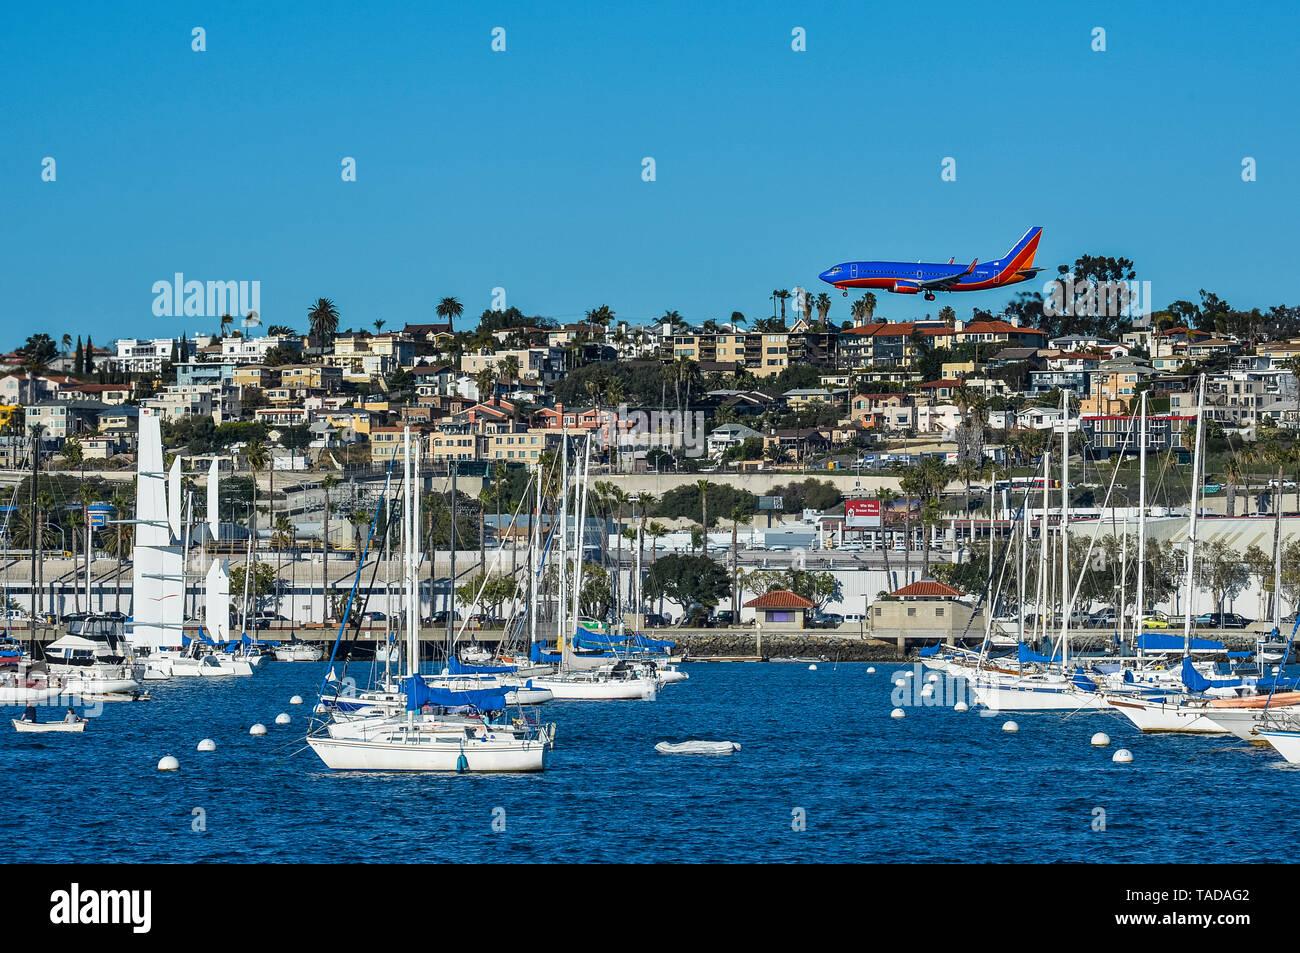 USA, California, San Diego, Airplane and sailing boats - Stock Image